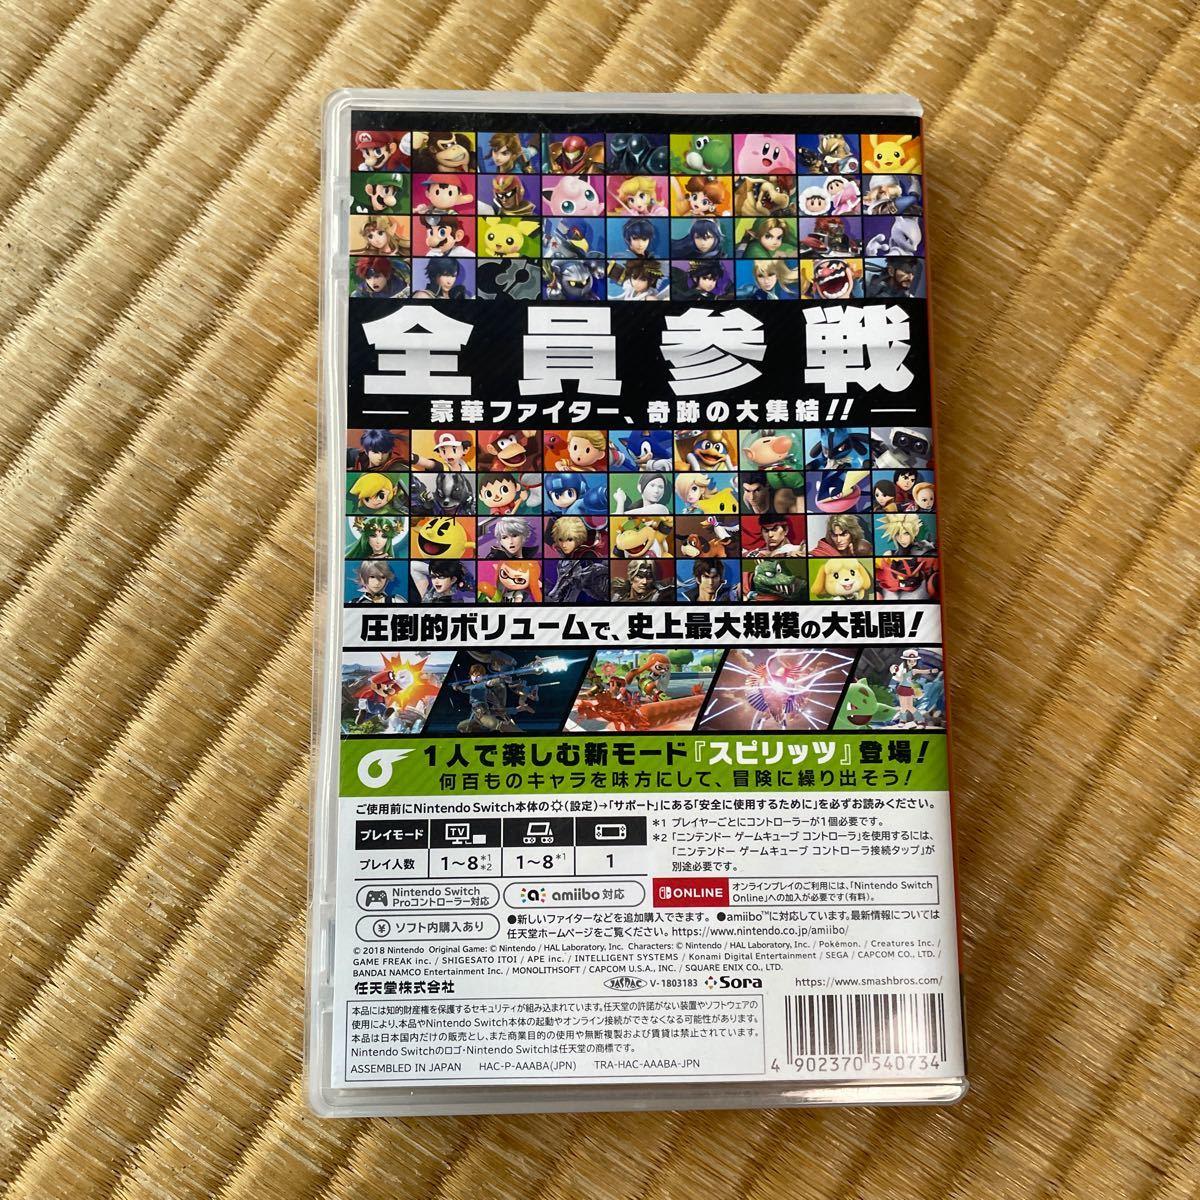 Switch 大乱闘スマッシュブラザーズSPECIAL